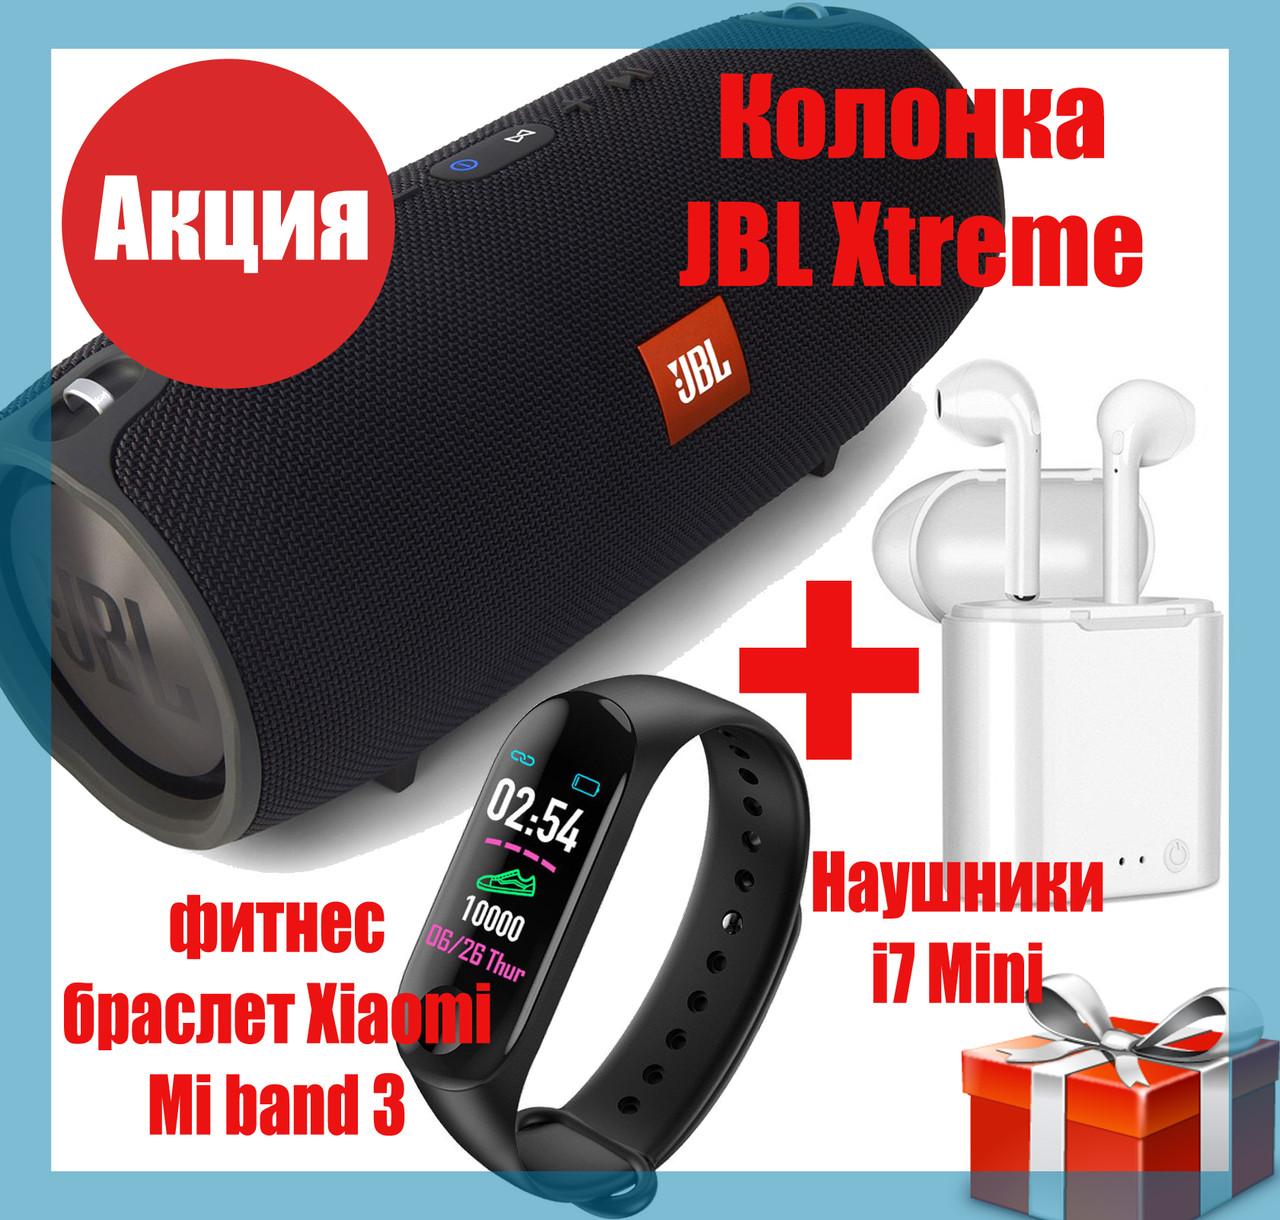 Колонка JBL XtremeЧерный, Фитнес браслет M3, наушники блютус i7S Mini Bluetooth Комплект QualitiReplica